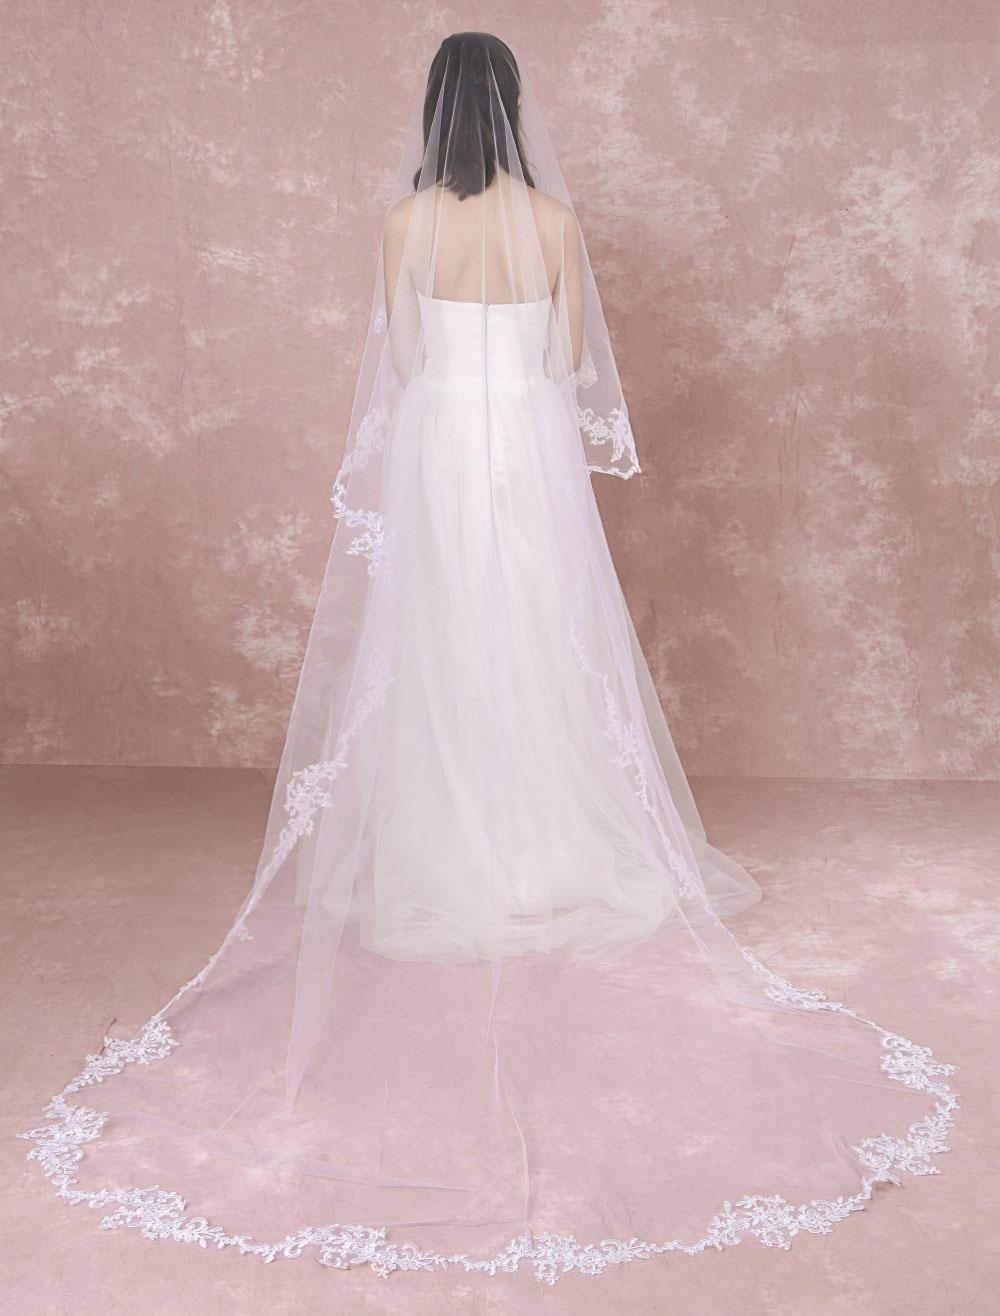 Cathedral Wedding Veil Lace Trim Applique Flower Tulle 1  Tier Bridal Veil